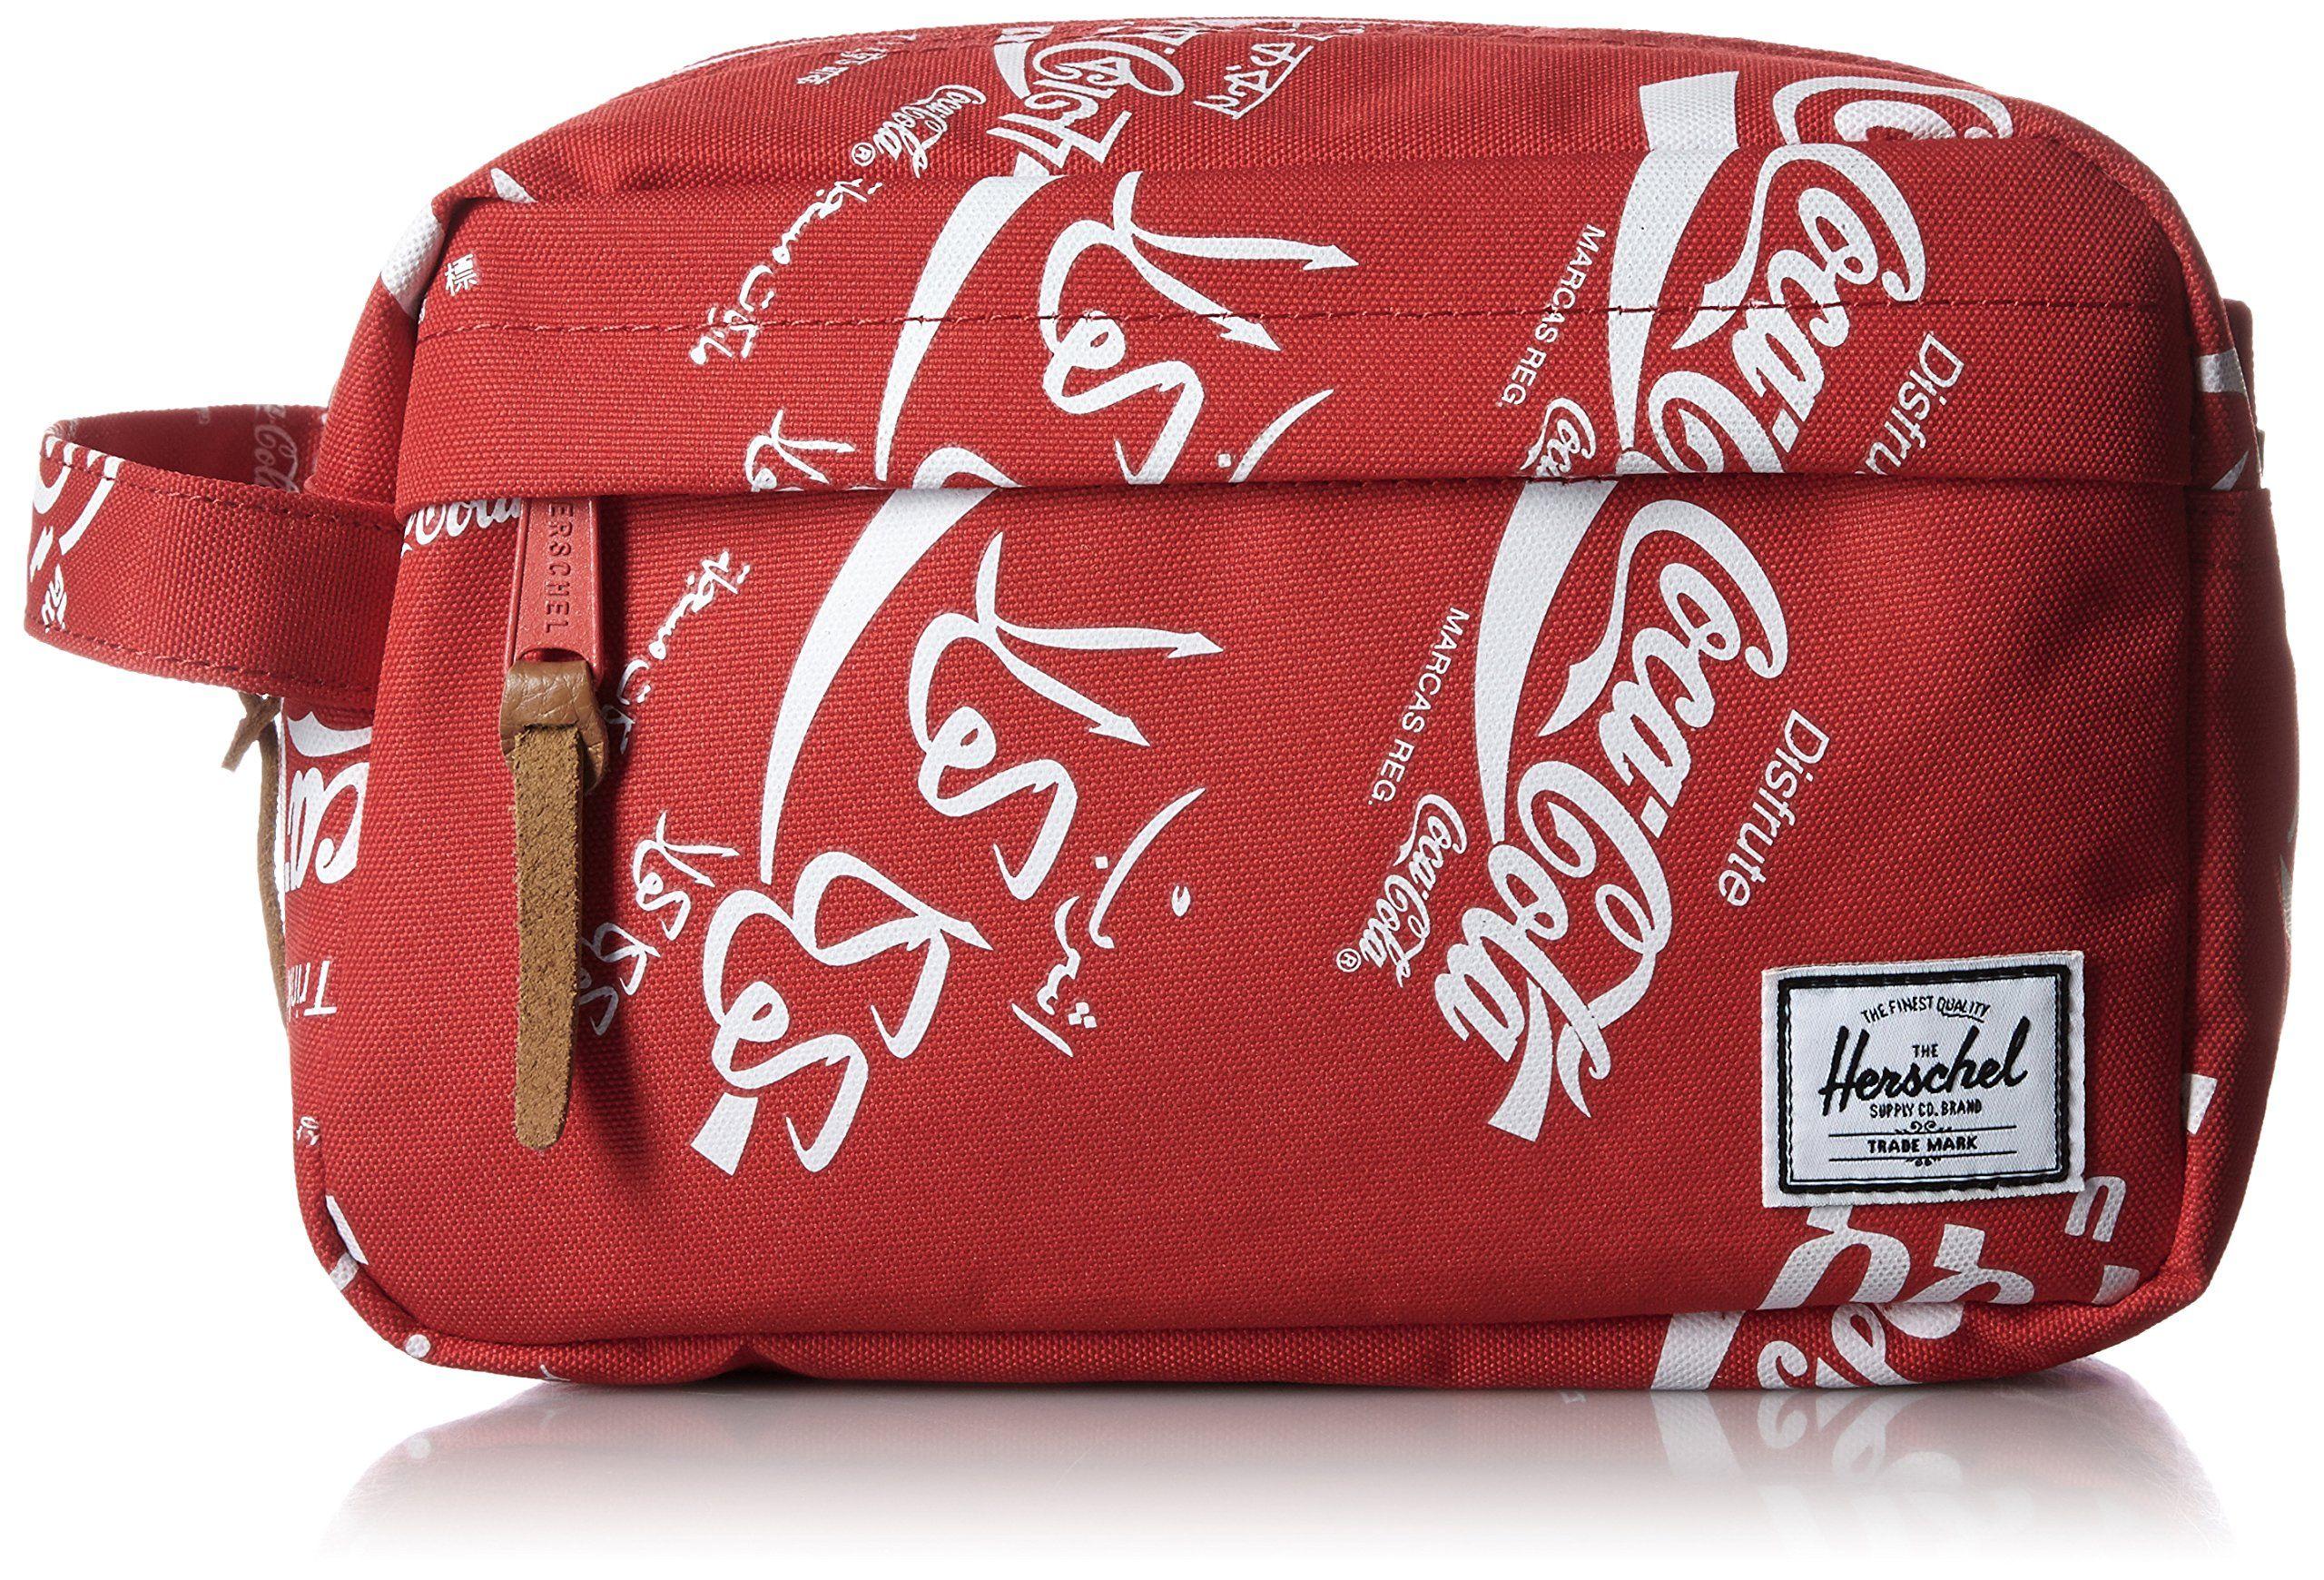 Herschel Supply Co. Women's Coca Cola x Herschel Chapter Travel Kit, Red Coca-Cola, One Size